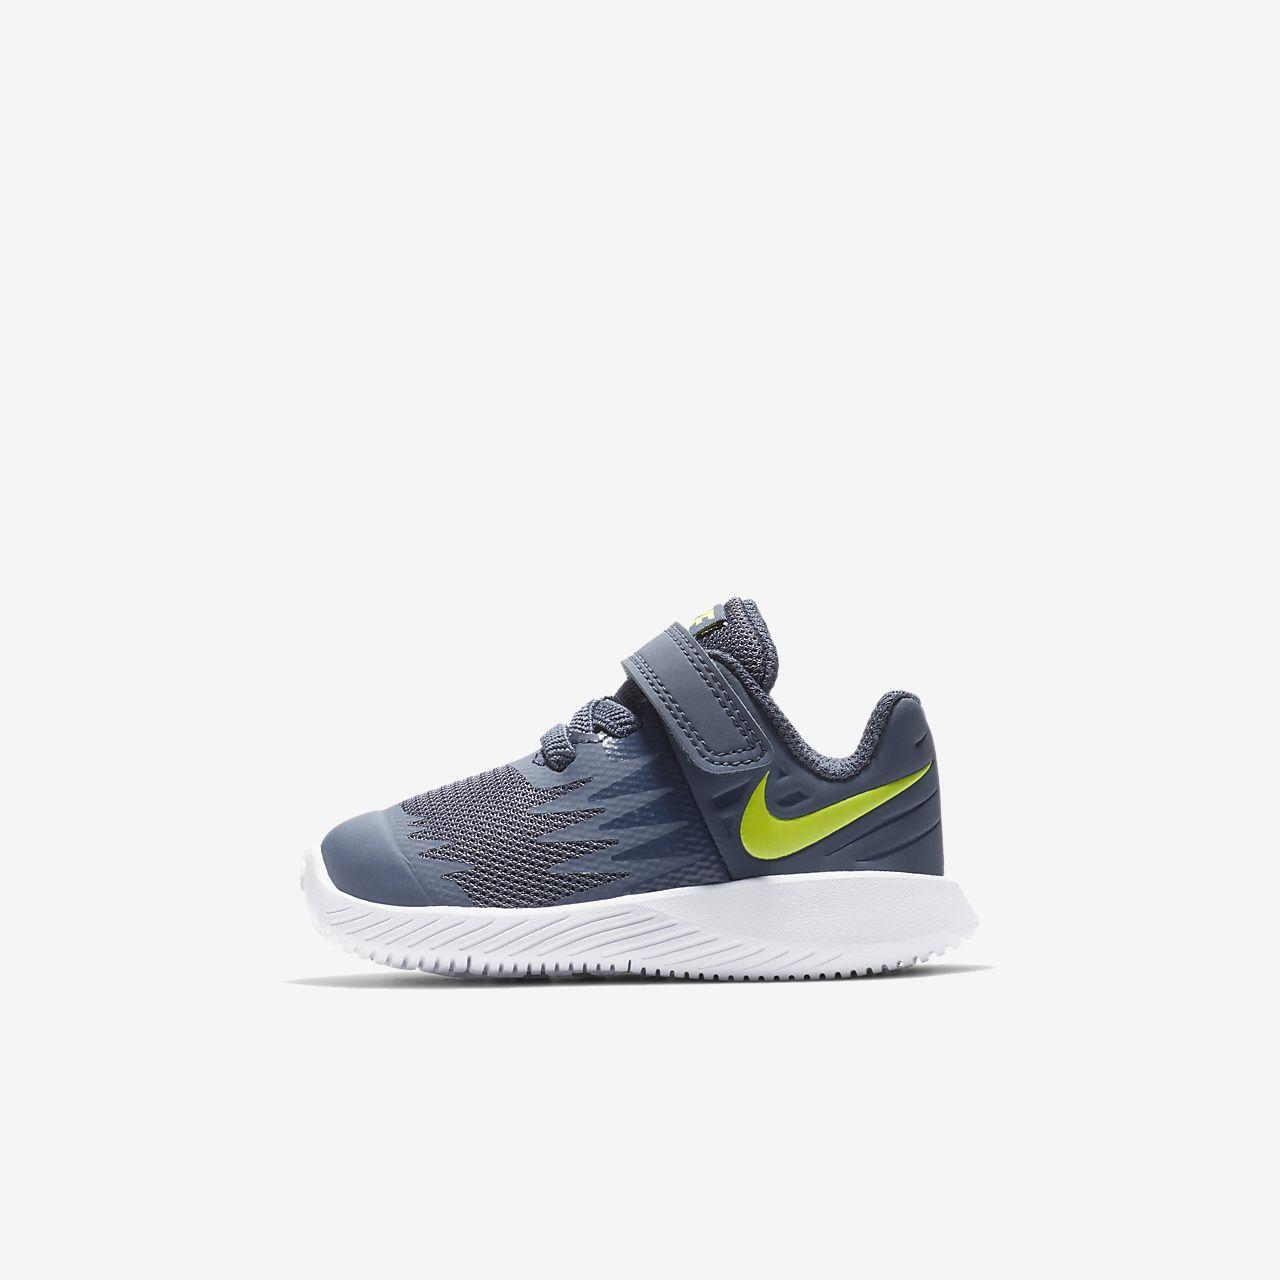 new product 82f91 17066 Nike Star Runner